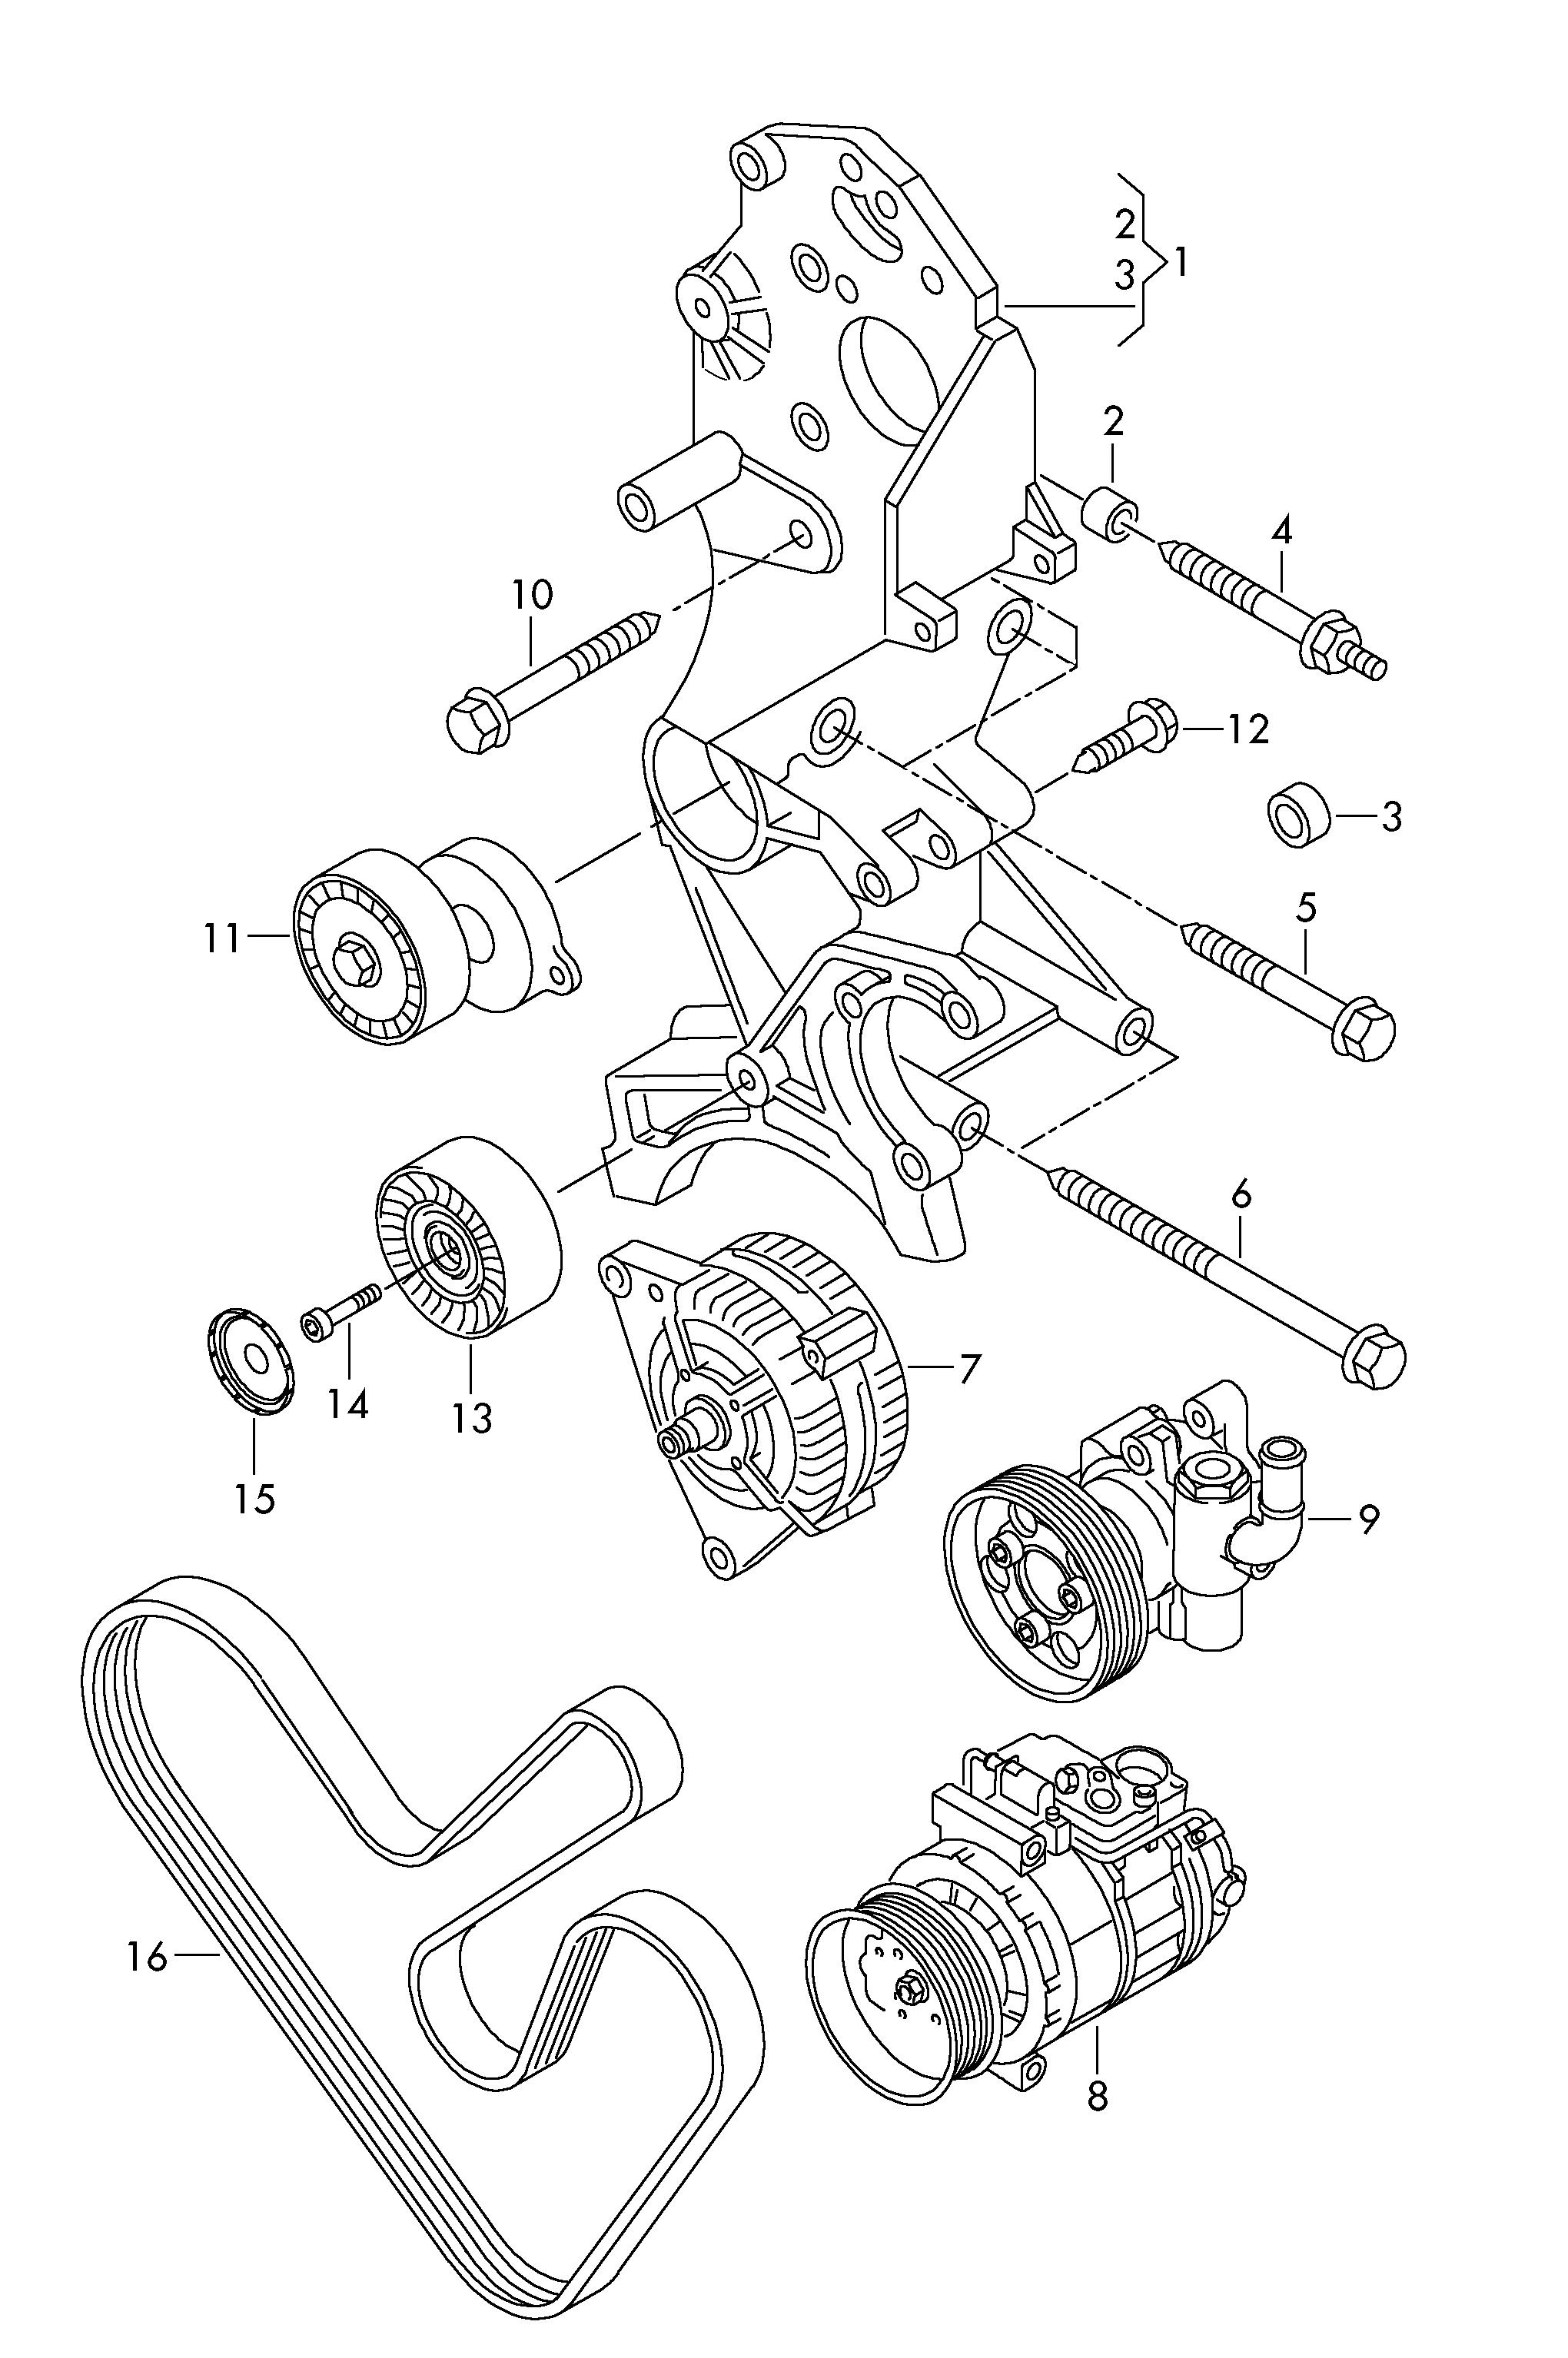 Трансмиссия амарок схема